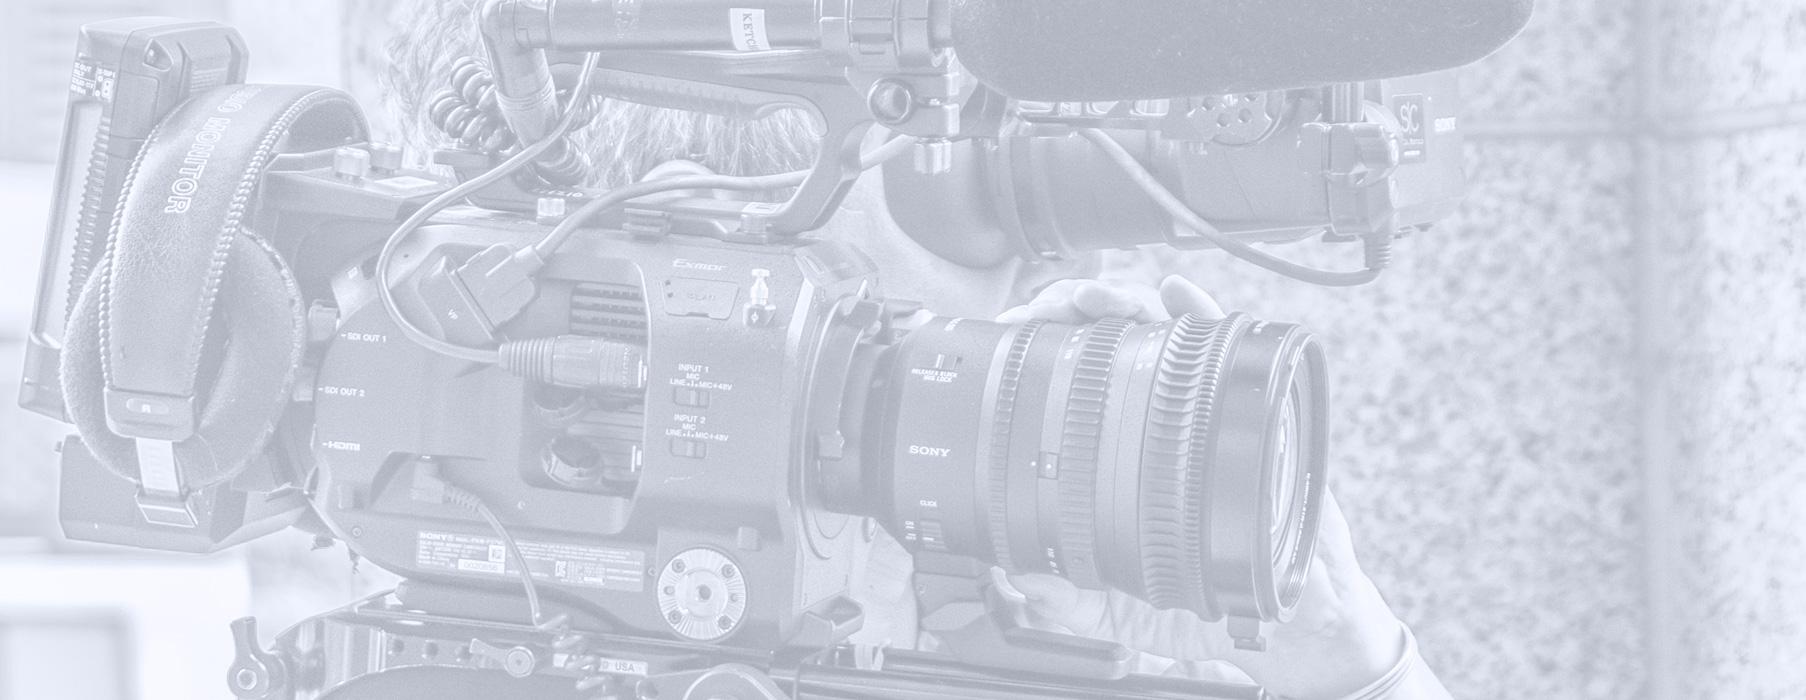 Média audio visuel, télévision, radio, reportage, interview